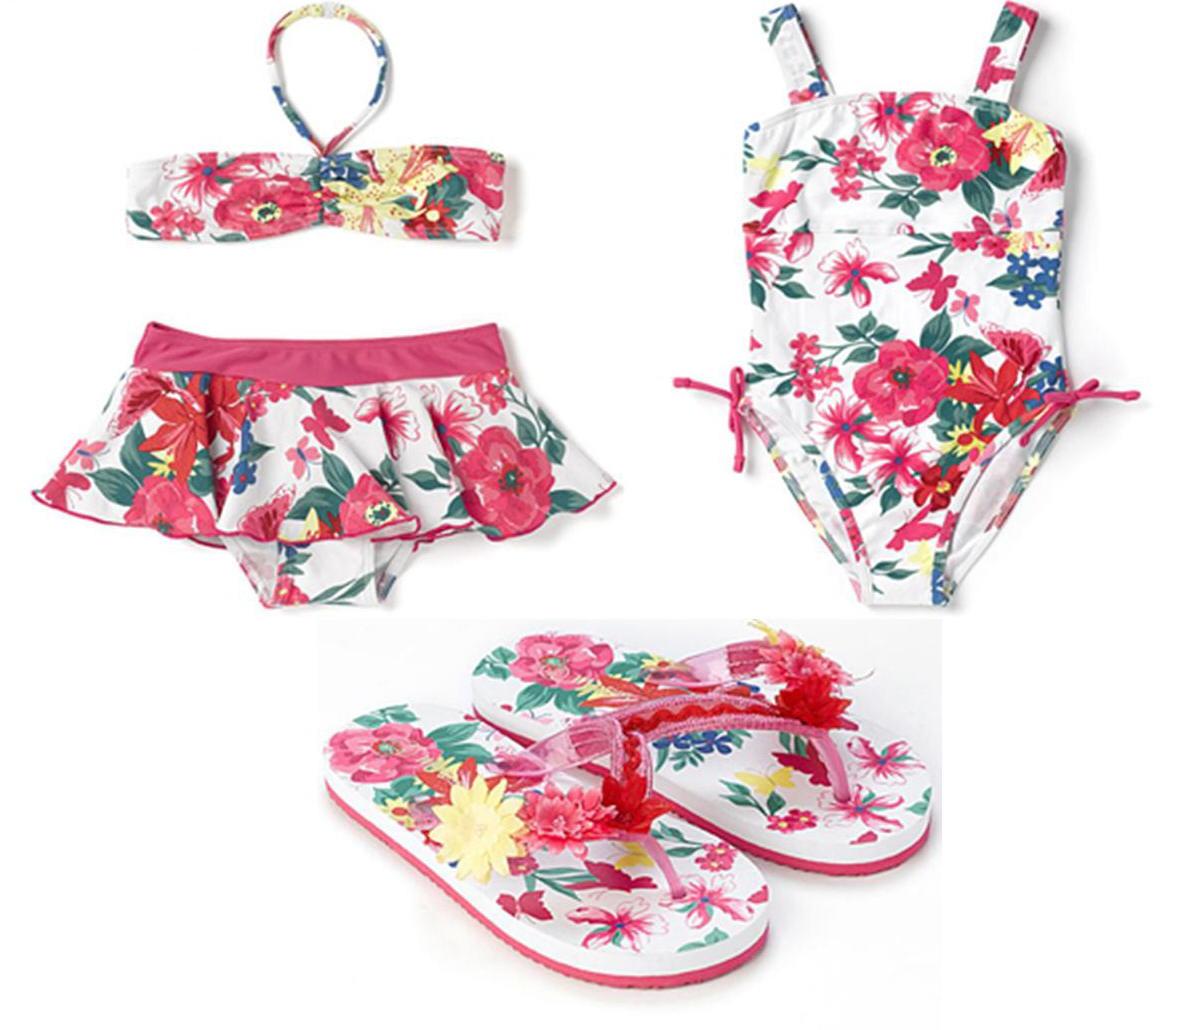 Lenceria Ropa De Baño:Lenceria y trajes de baño: Ropa de playa para niña de Monsoon